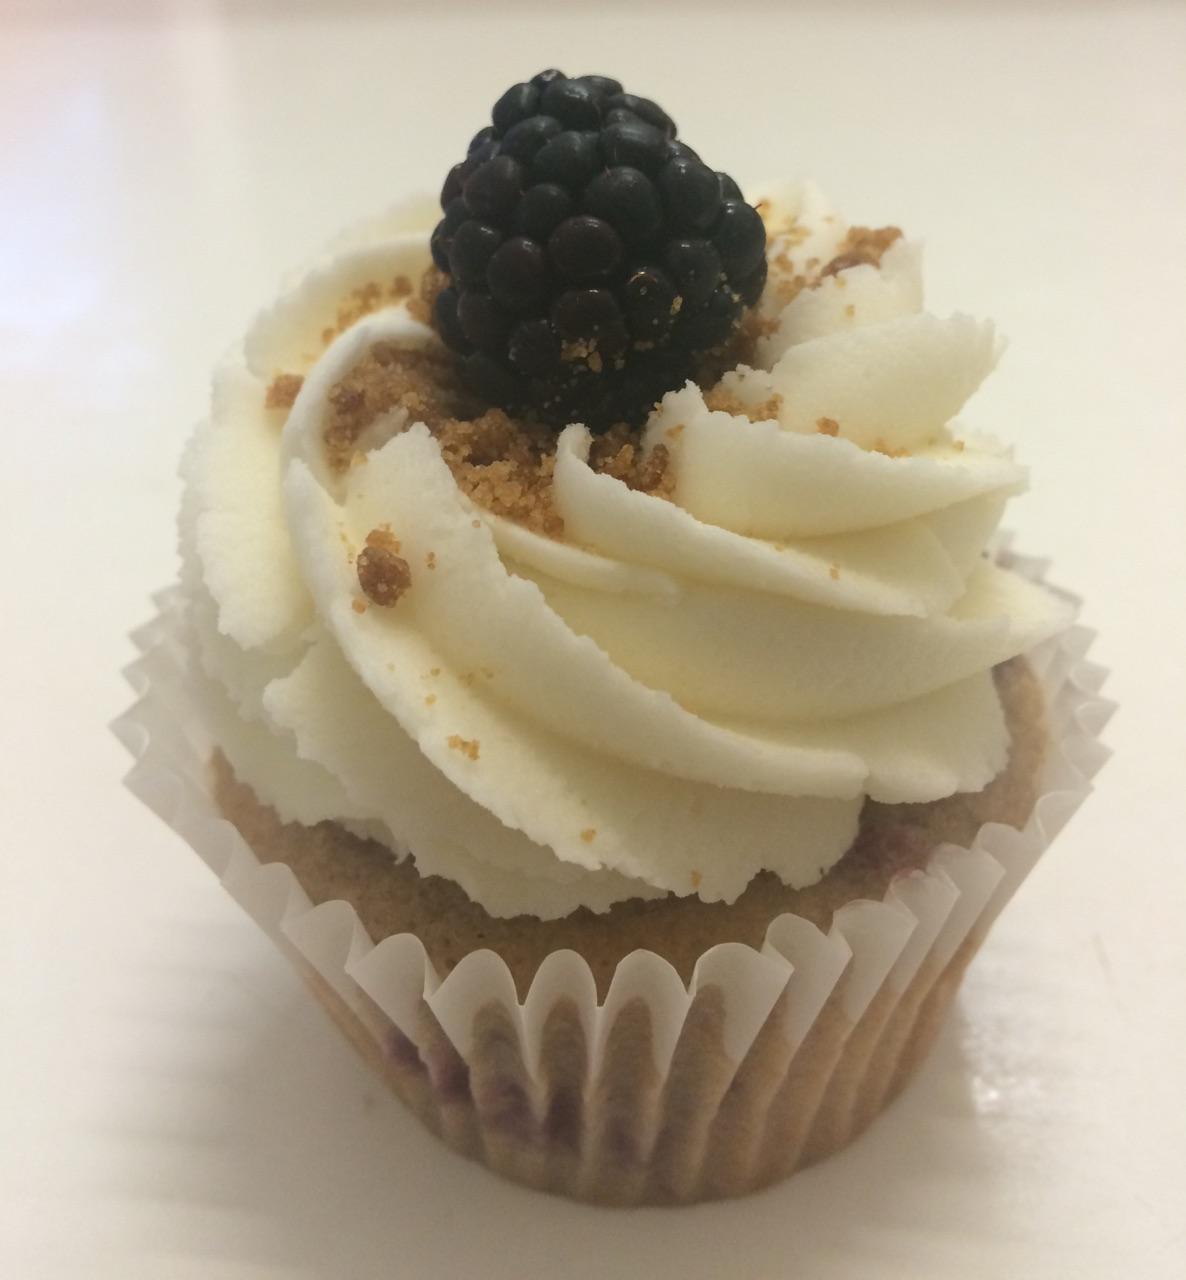 https://i2.wp.com/fatgayvegan.com/wp-content/uploads/2015/04/Blackberry-Cheesecake.jpg?fit=1186%2C1280&ssl=1